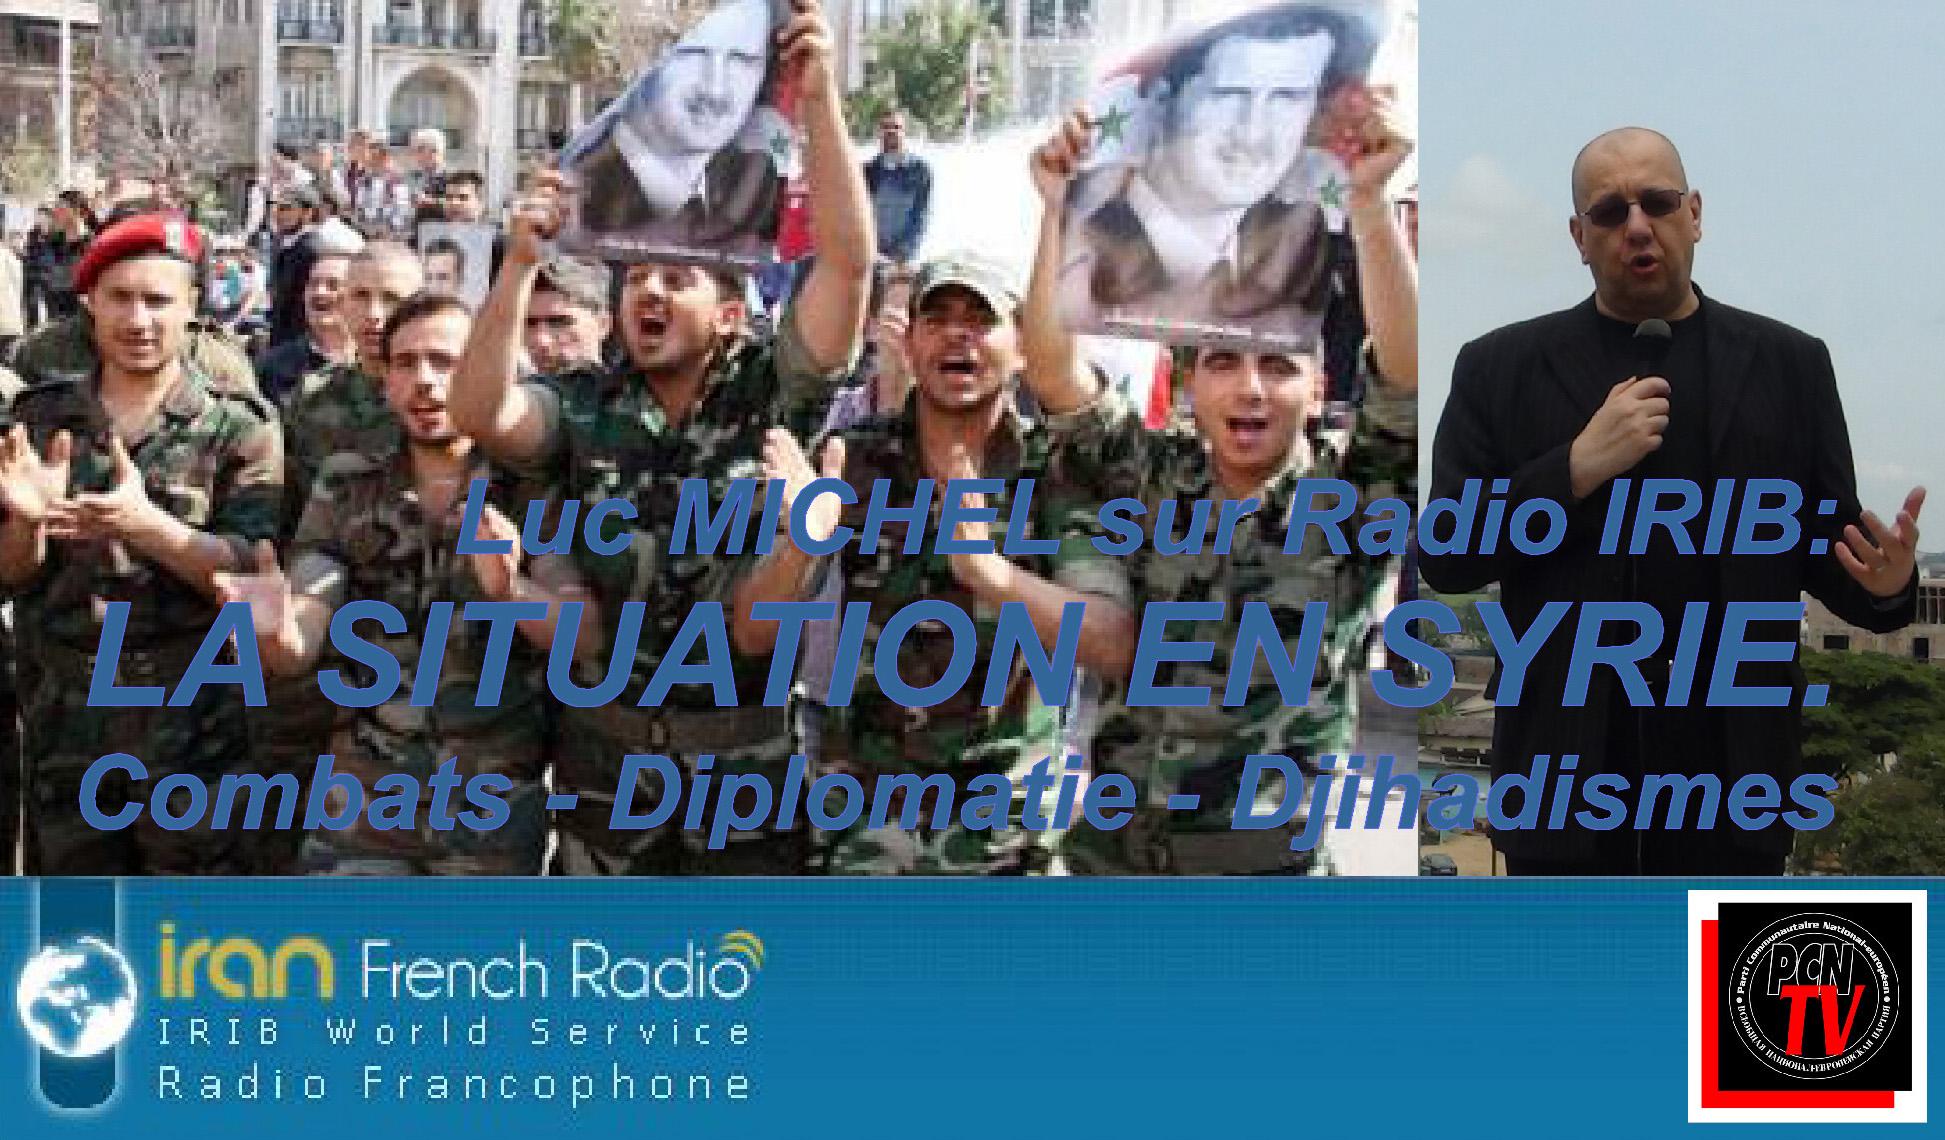 PCN-TV - LM sur IRIB situation geopol syrie 2015 (2015 02 21) FR